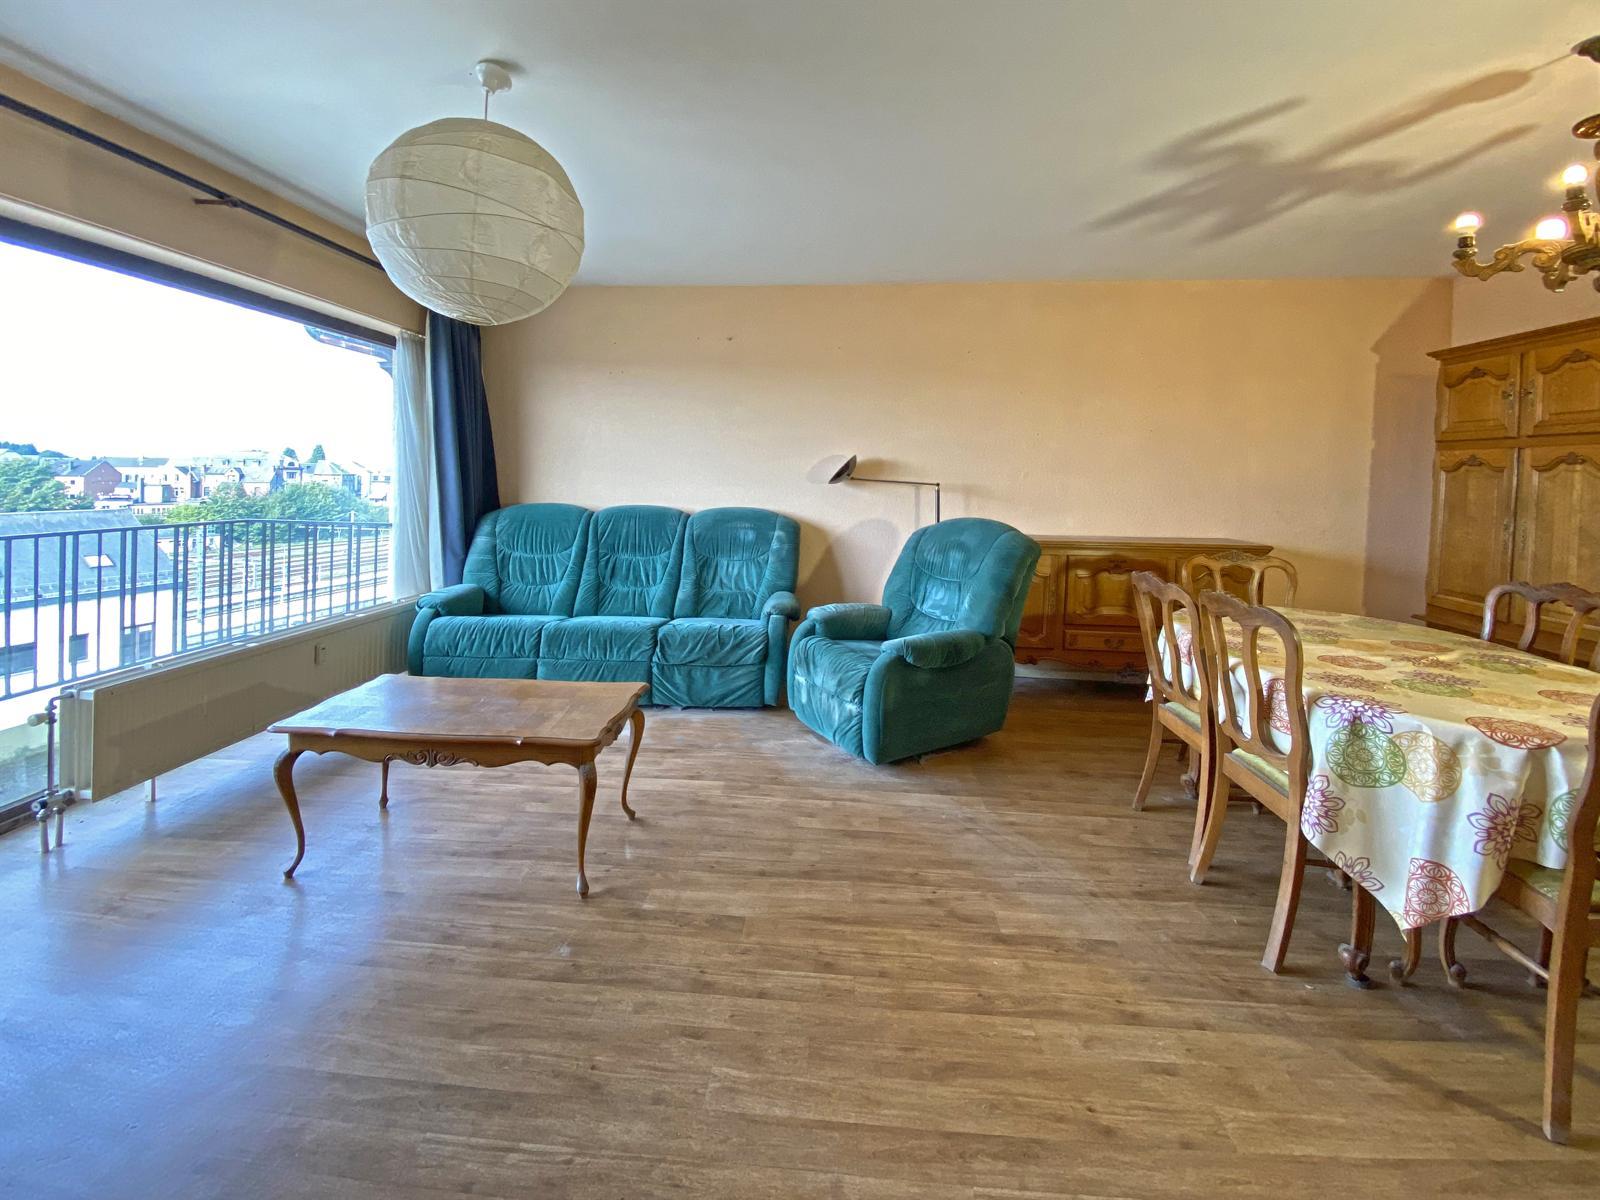 Appartement - Libramont-Chevigny - #4501248-1